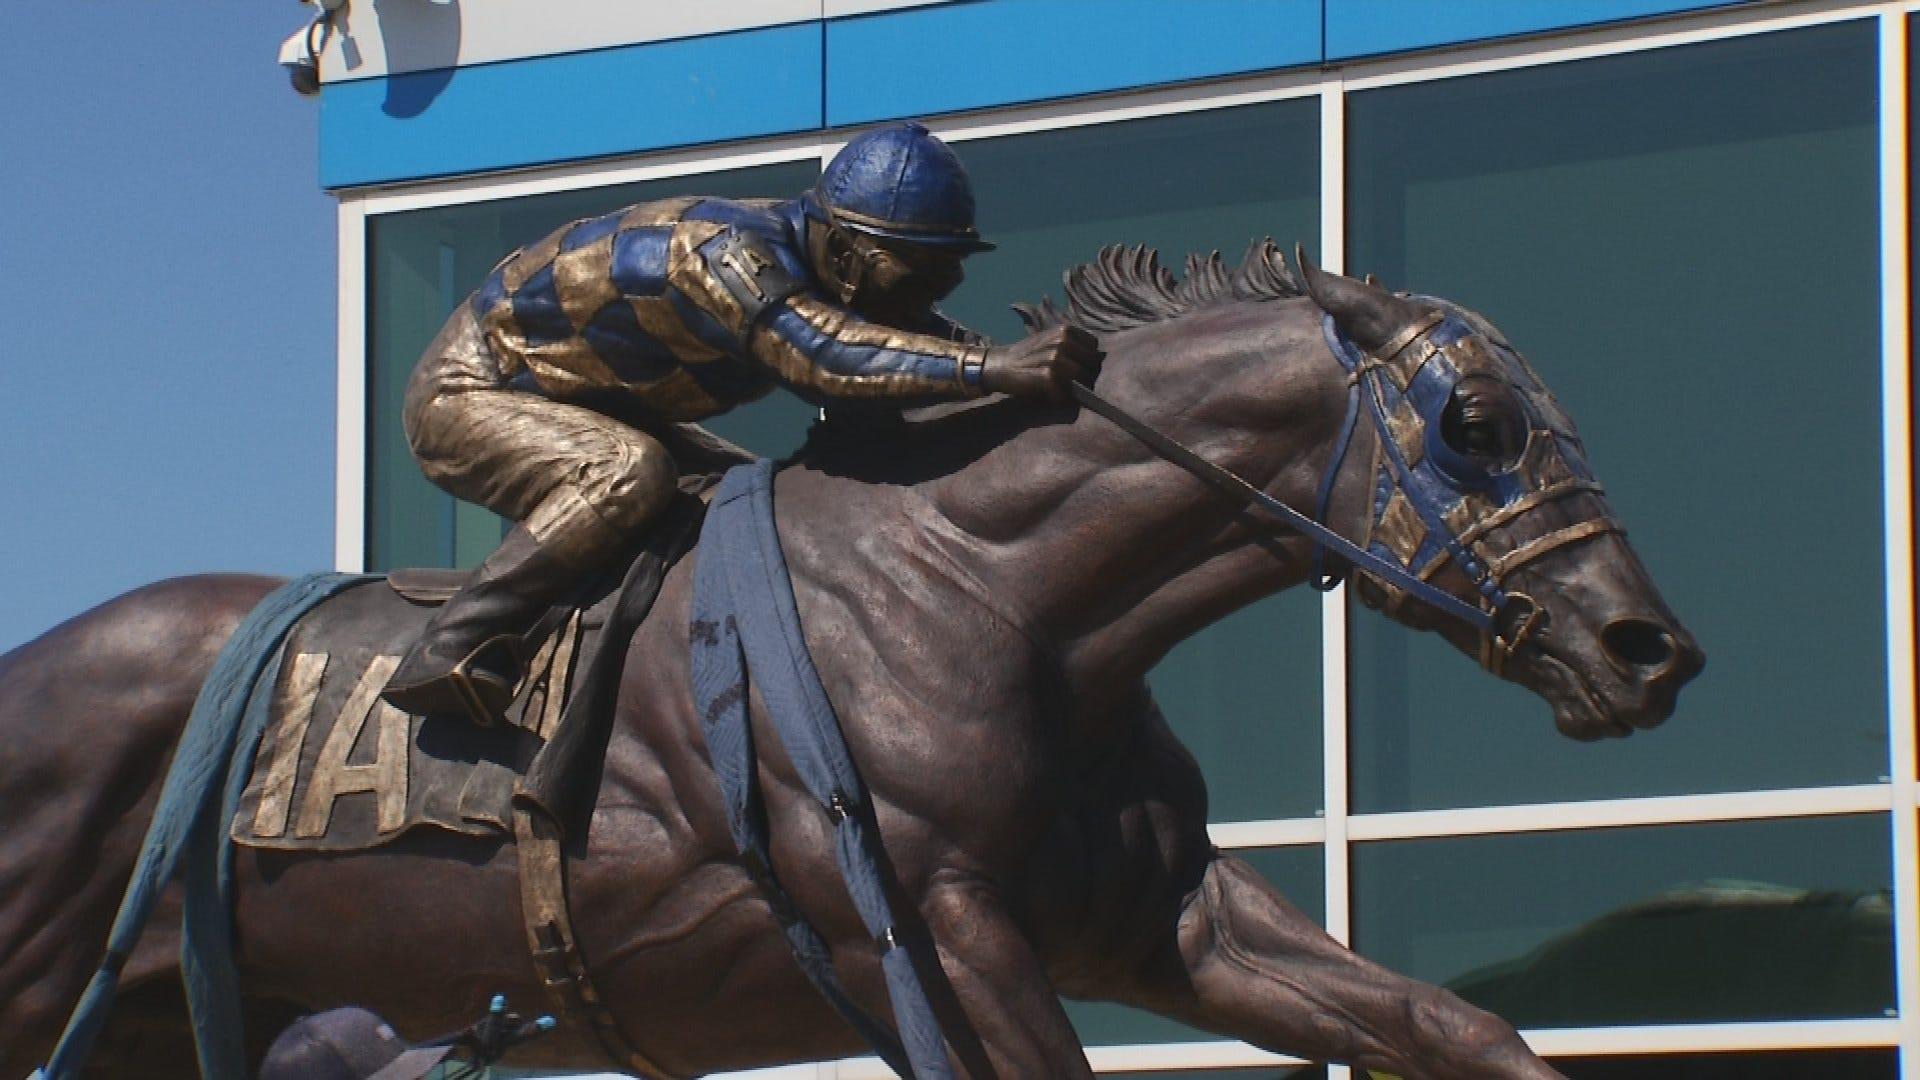 Sculptor Jocelyn Russell On Creating Amazing Secretariat Statue